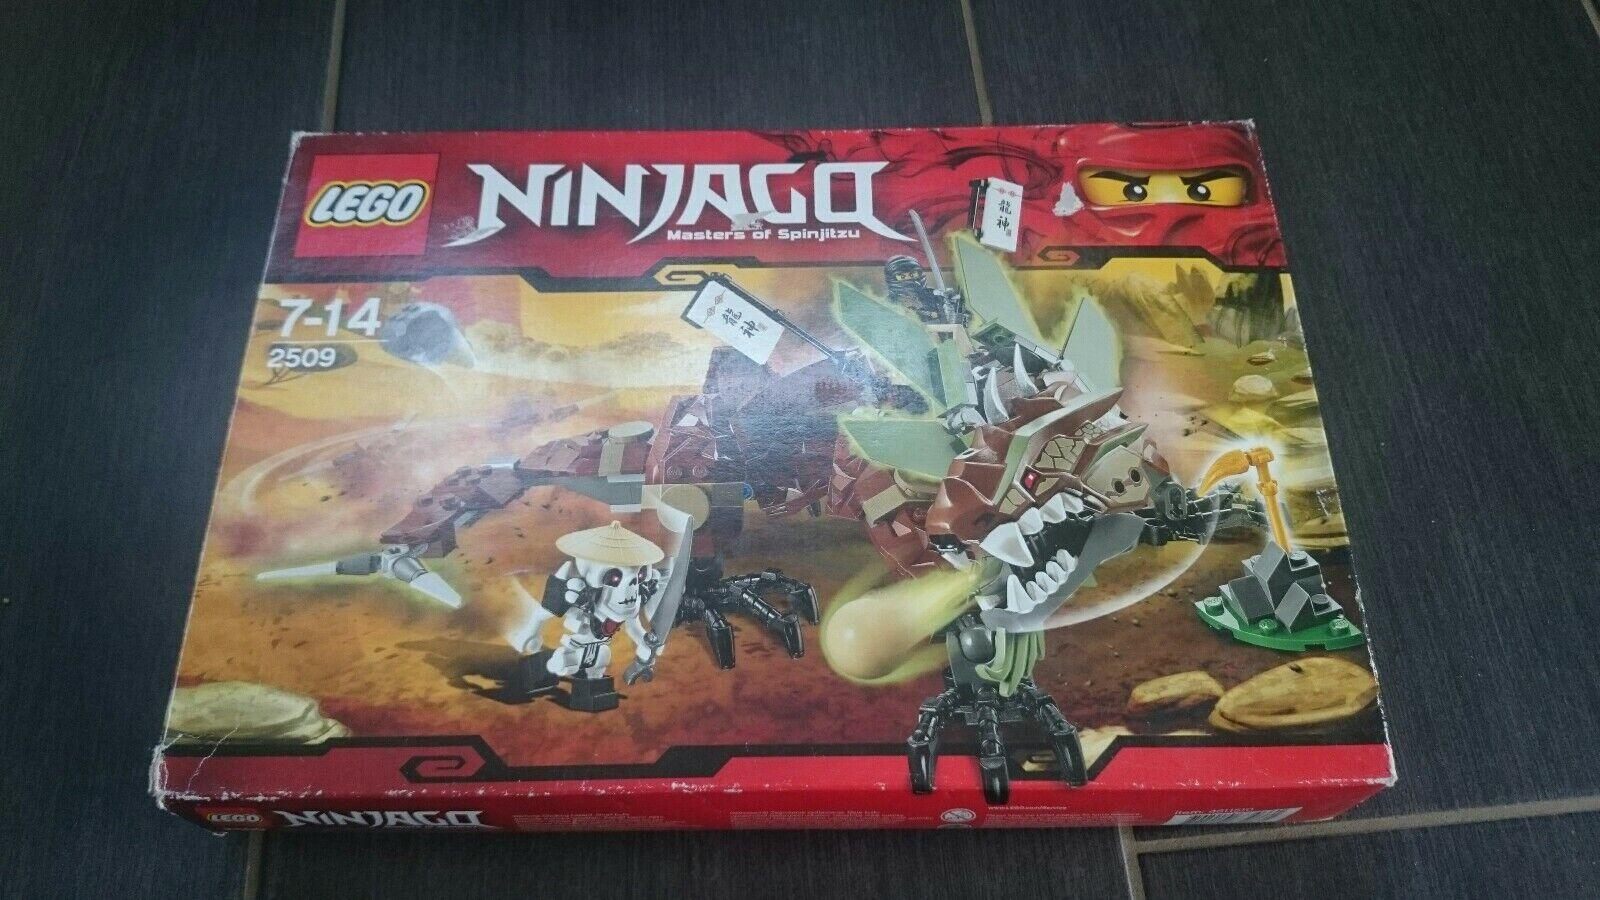 LEGO Ninjago 2509 erddrache  Masters of Spinjitzu 8-14  servizio di prima classe